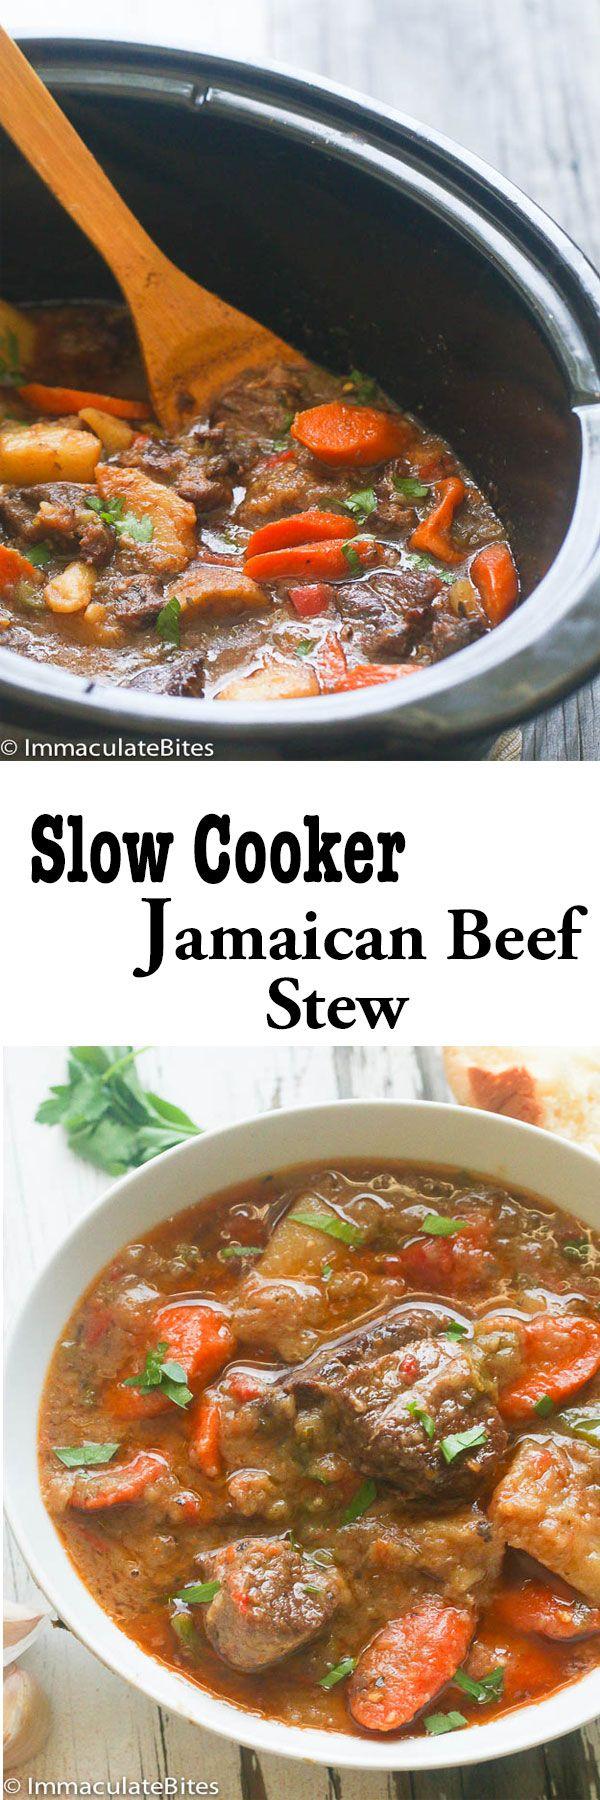 Slow Cooker Jamaican Beef Stew Recipe Vegetable Stew